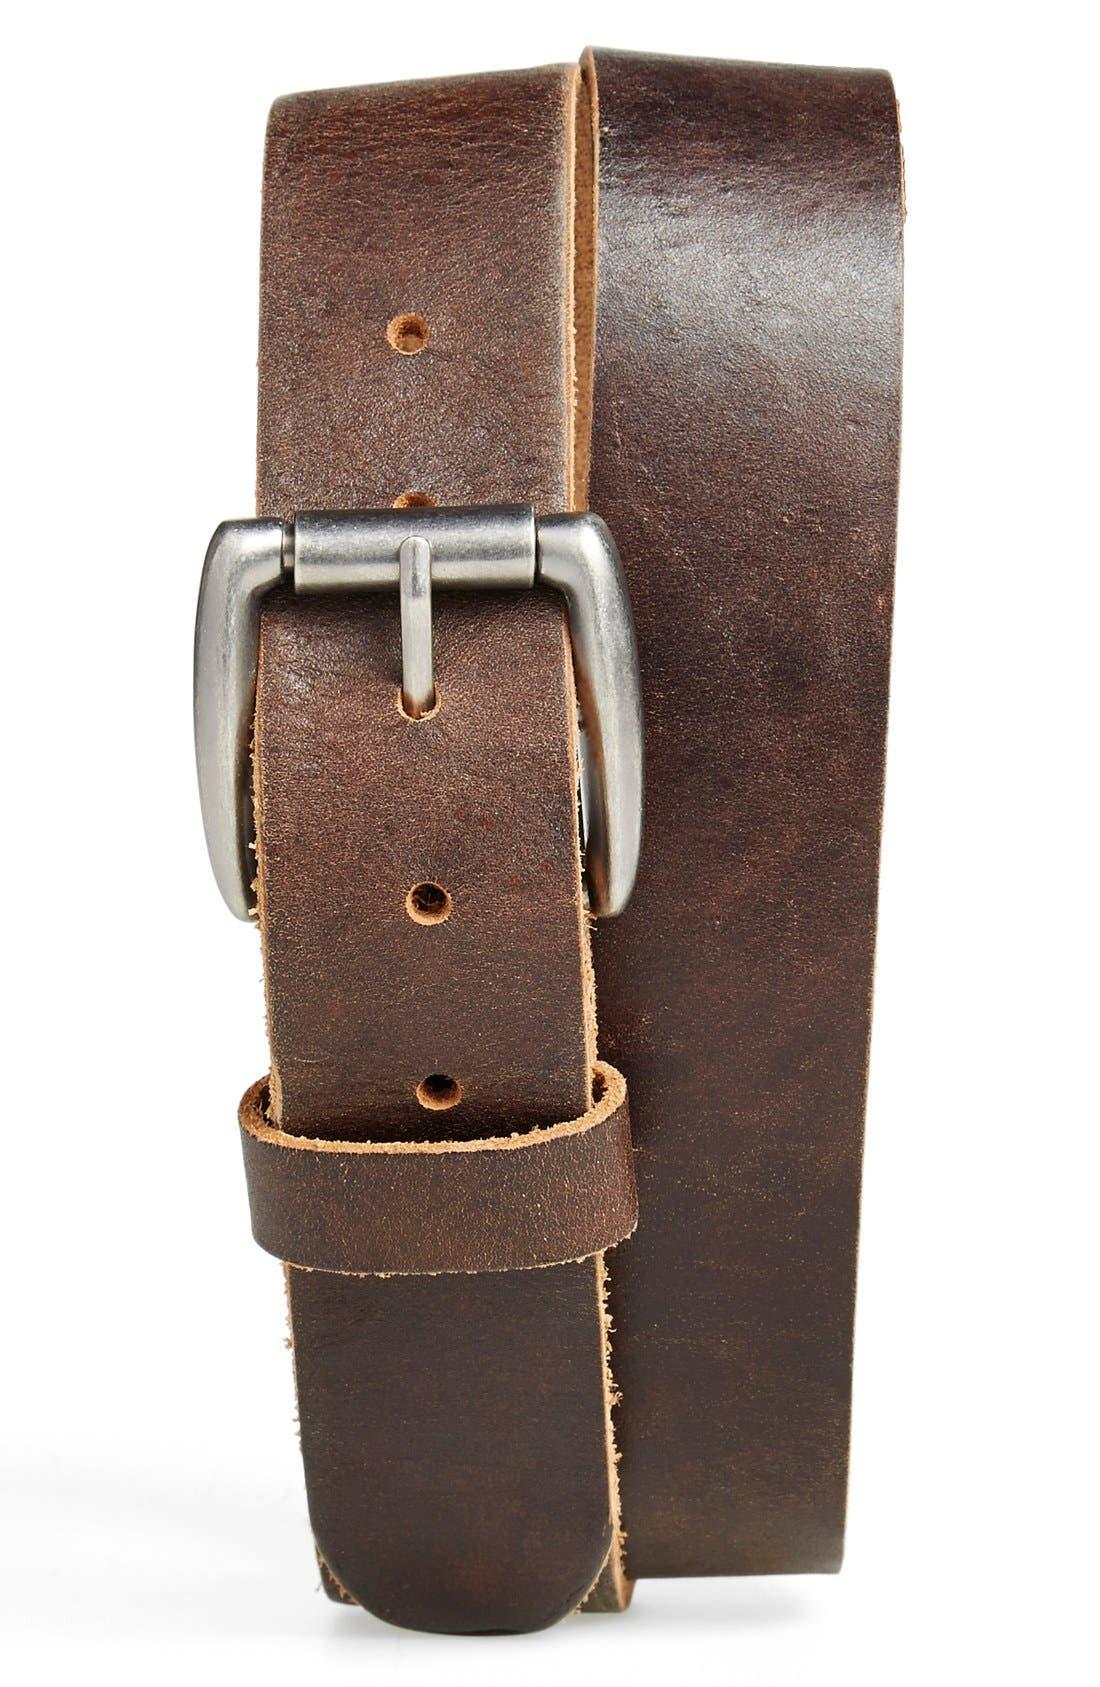 Main Image - Bill Adler 1981 Roller Buckle Belt